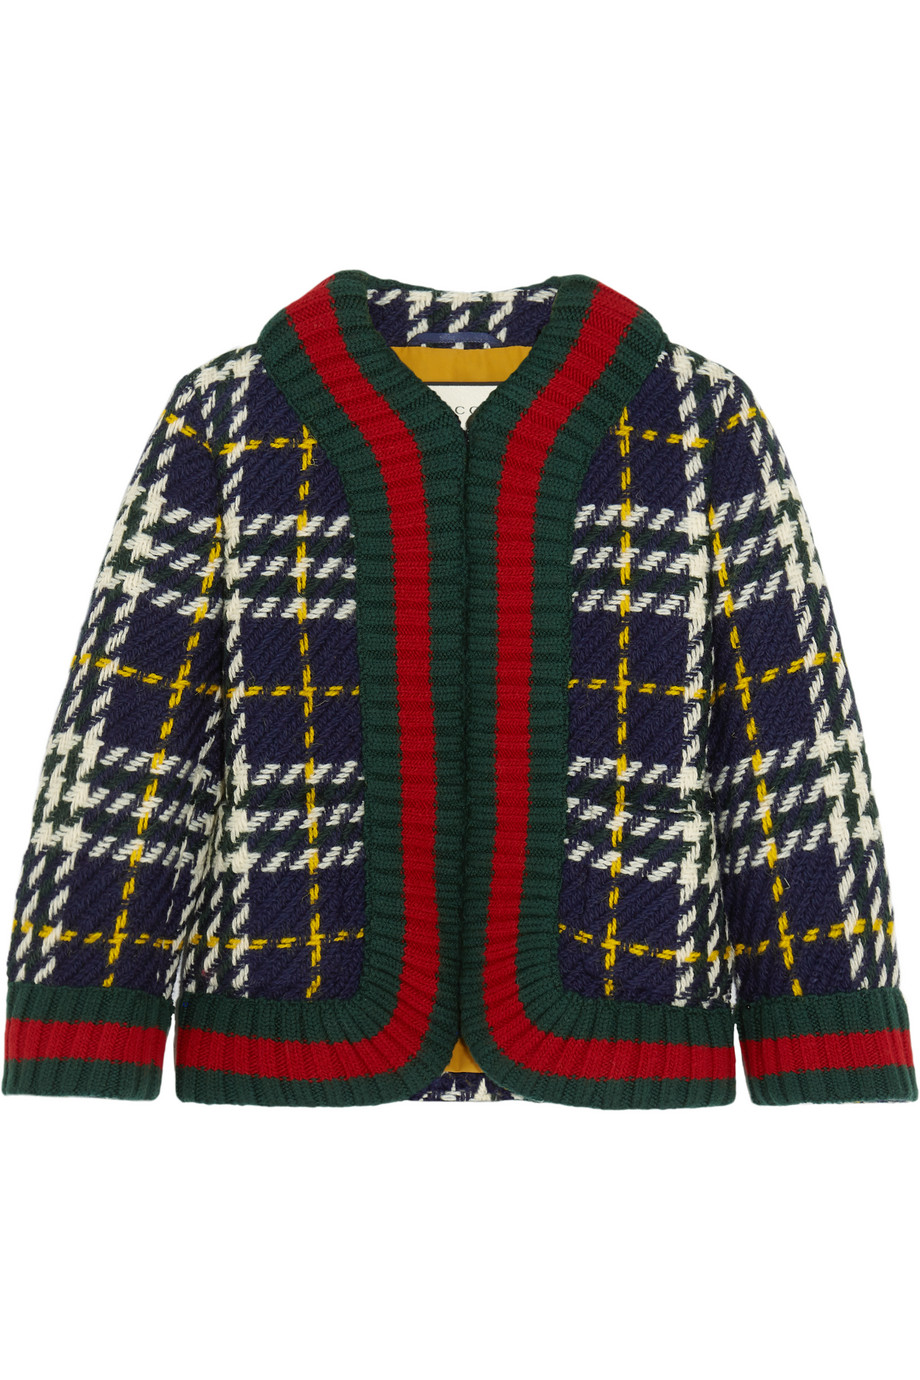 Gucci Cropped Plaid Wool Jacket, Emerald, Women's, Size: 34